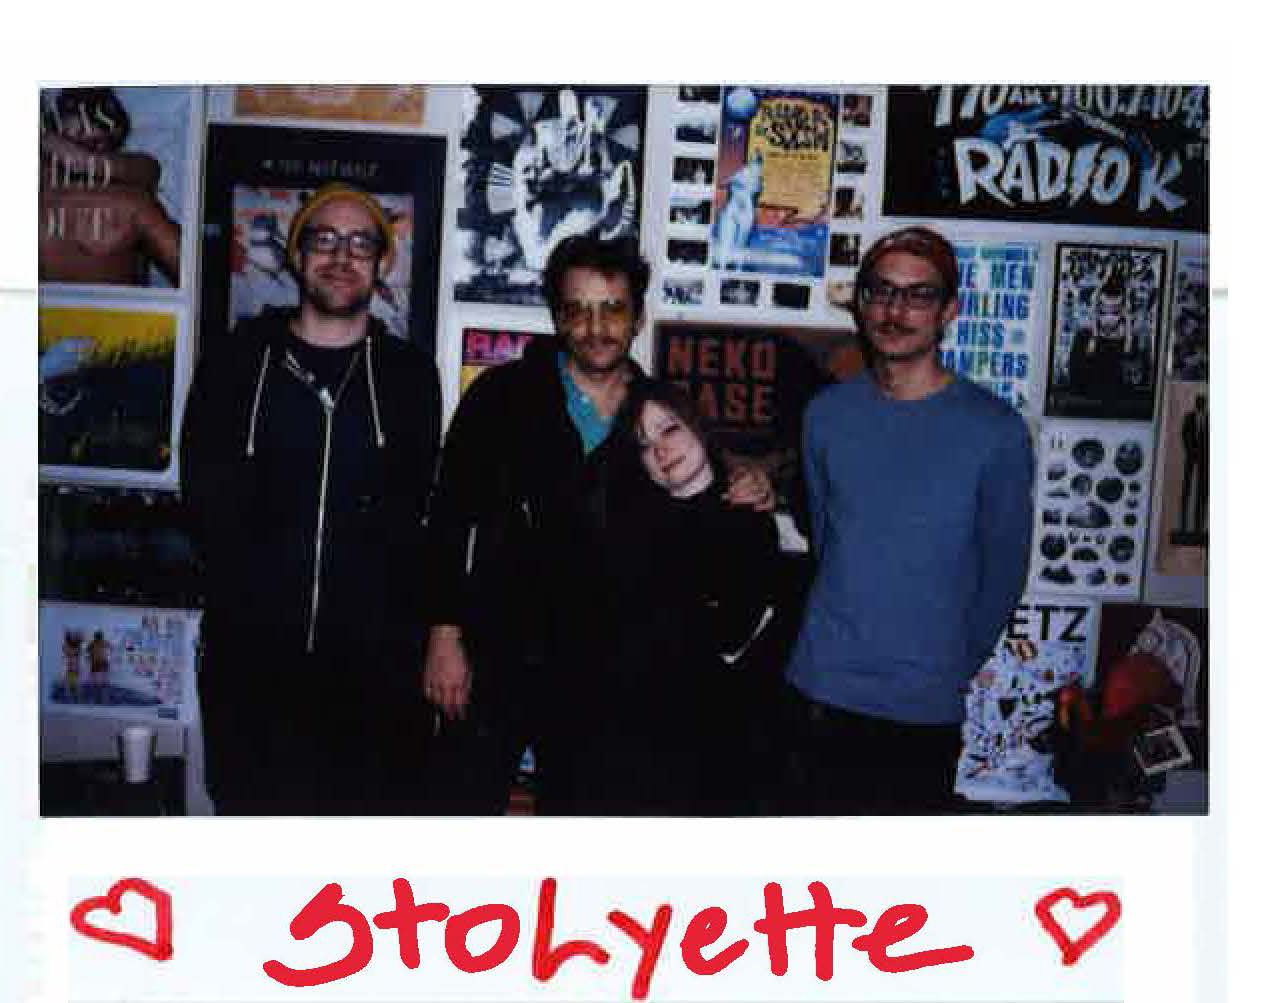 StoLyette